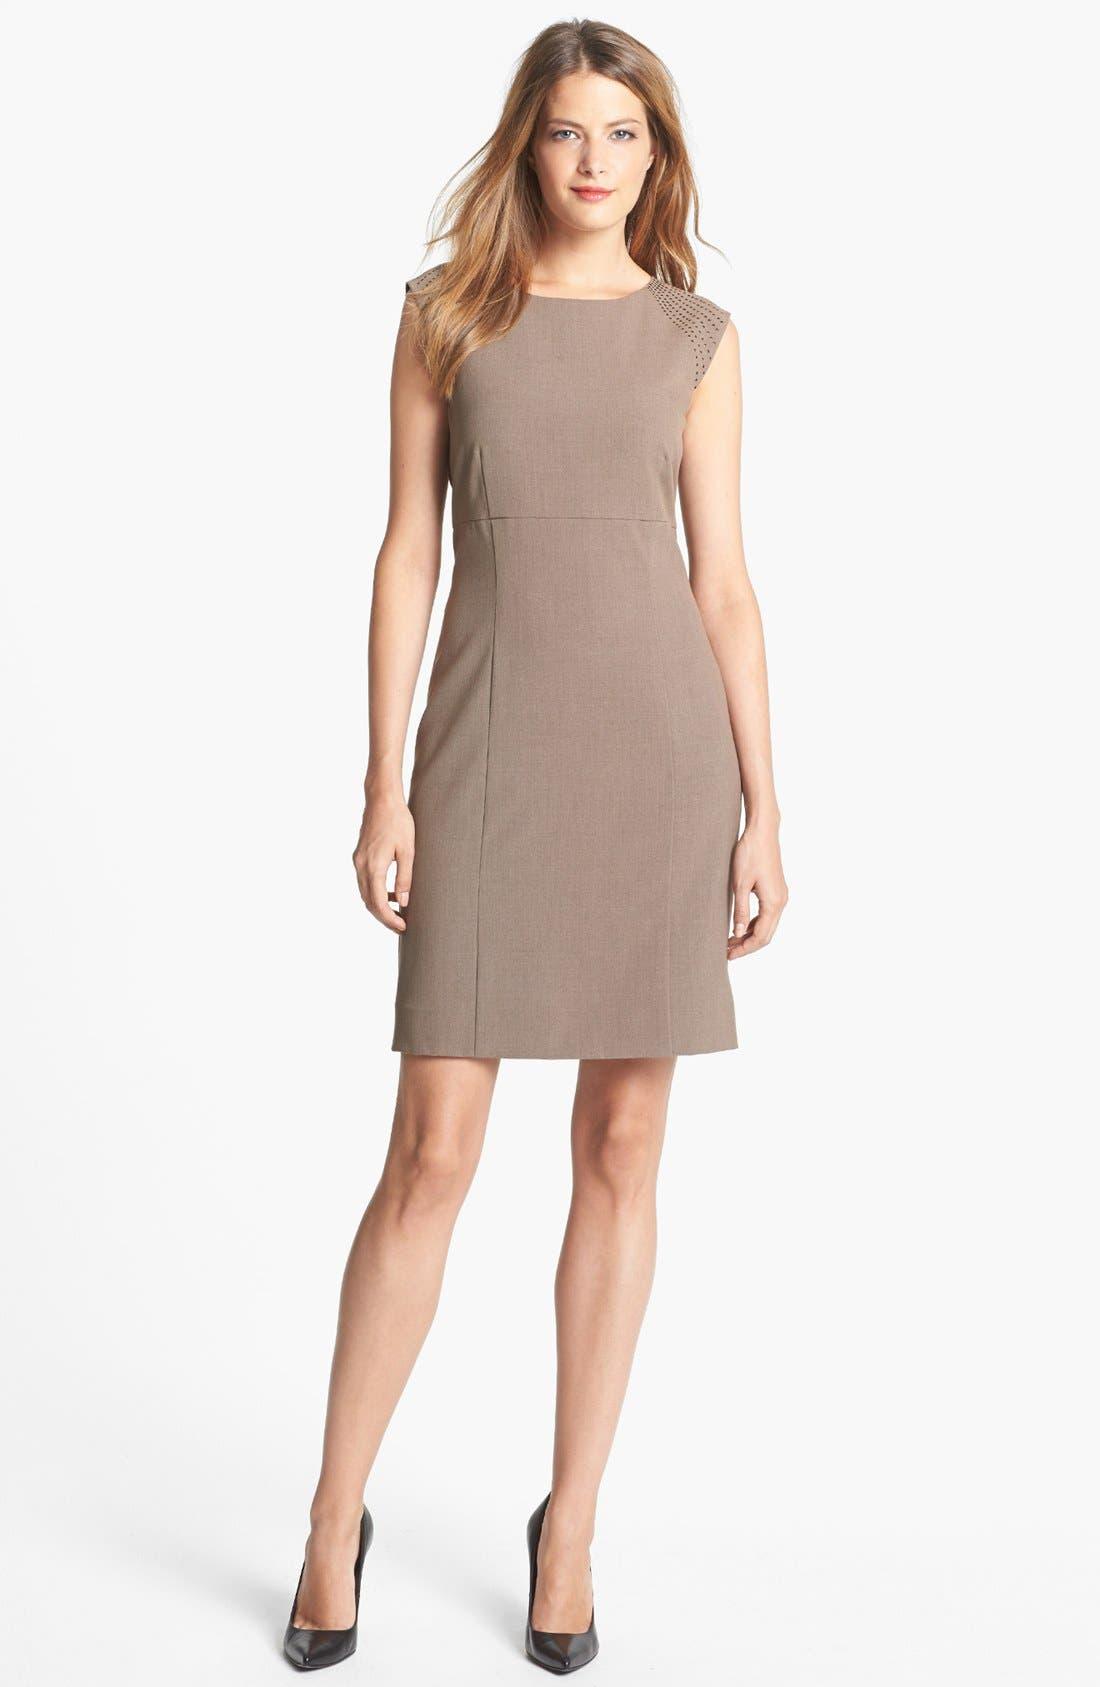 Main Image - Tahari Studded Shoulder Two-Way Stretch Sheath Dress